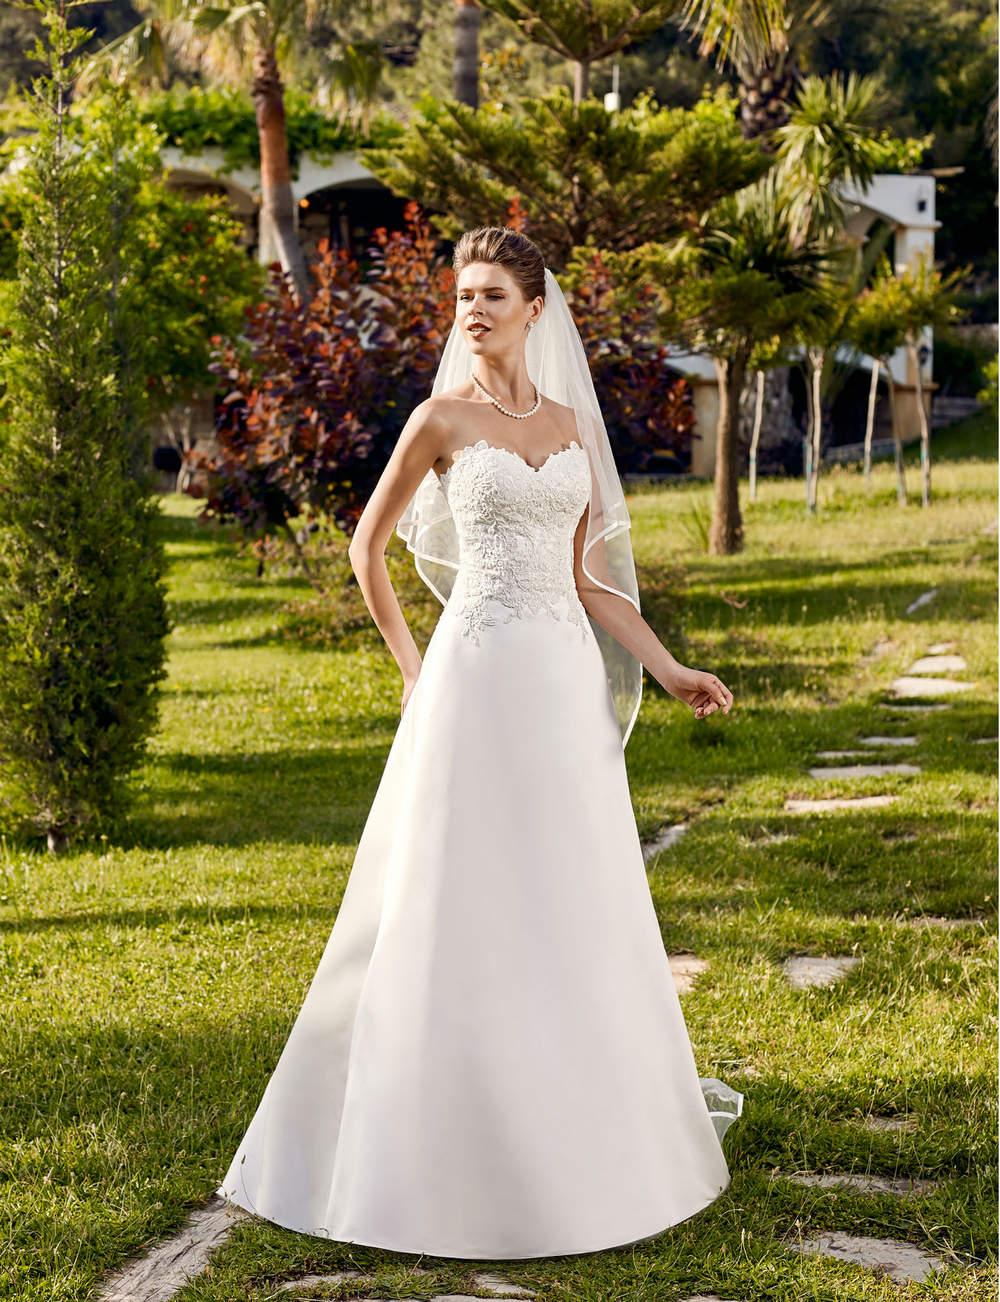 les plus belles robes de mari e 2016 le mariage. Black Bedroom Furniture Sets. Home Design Ideas